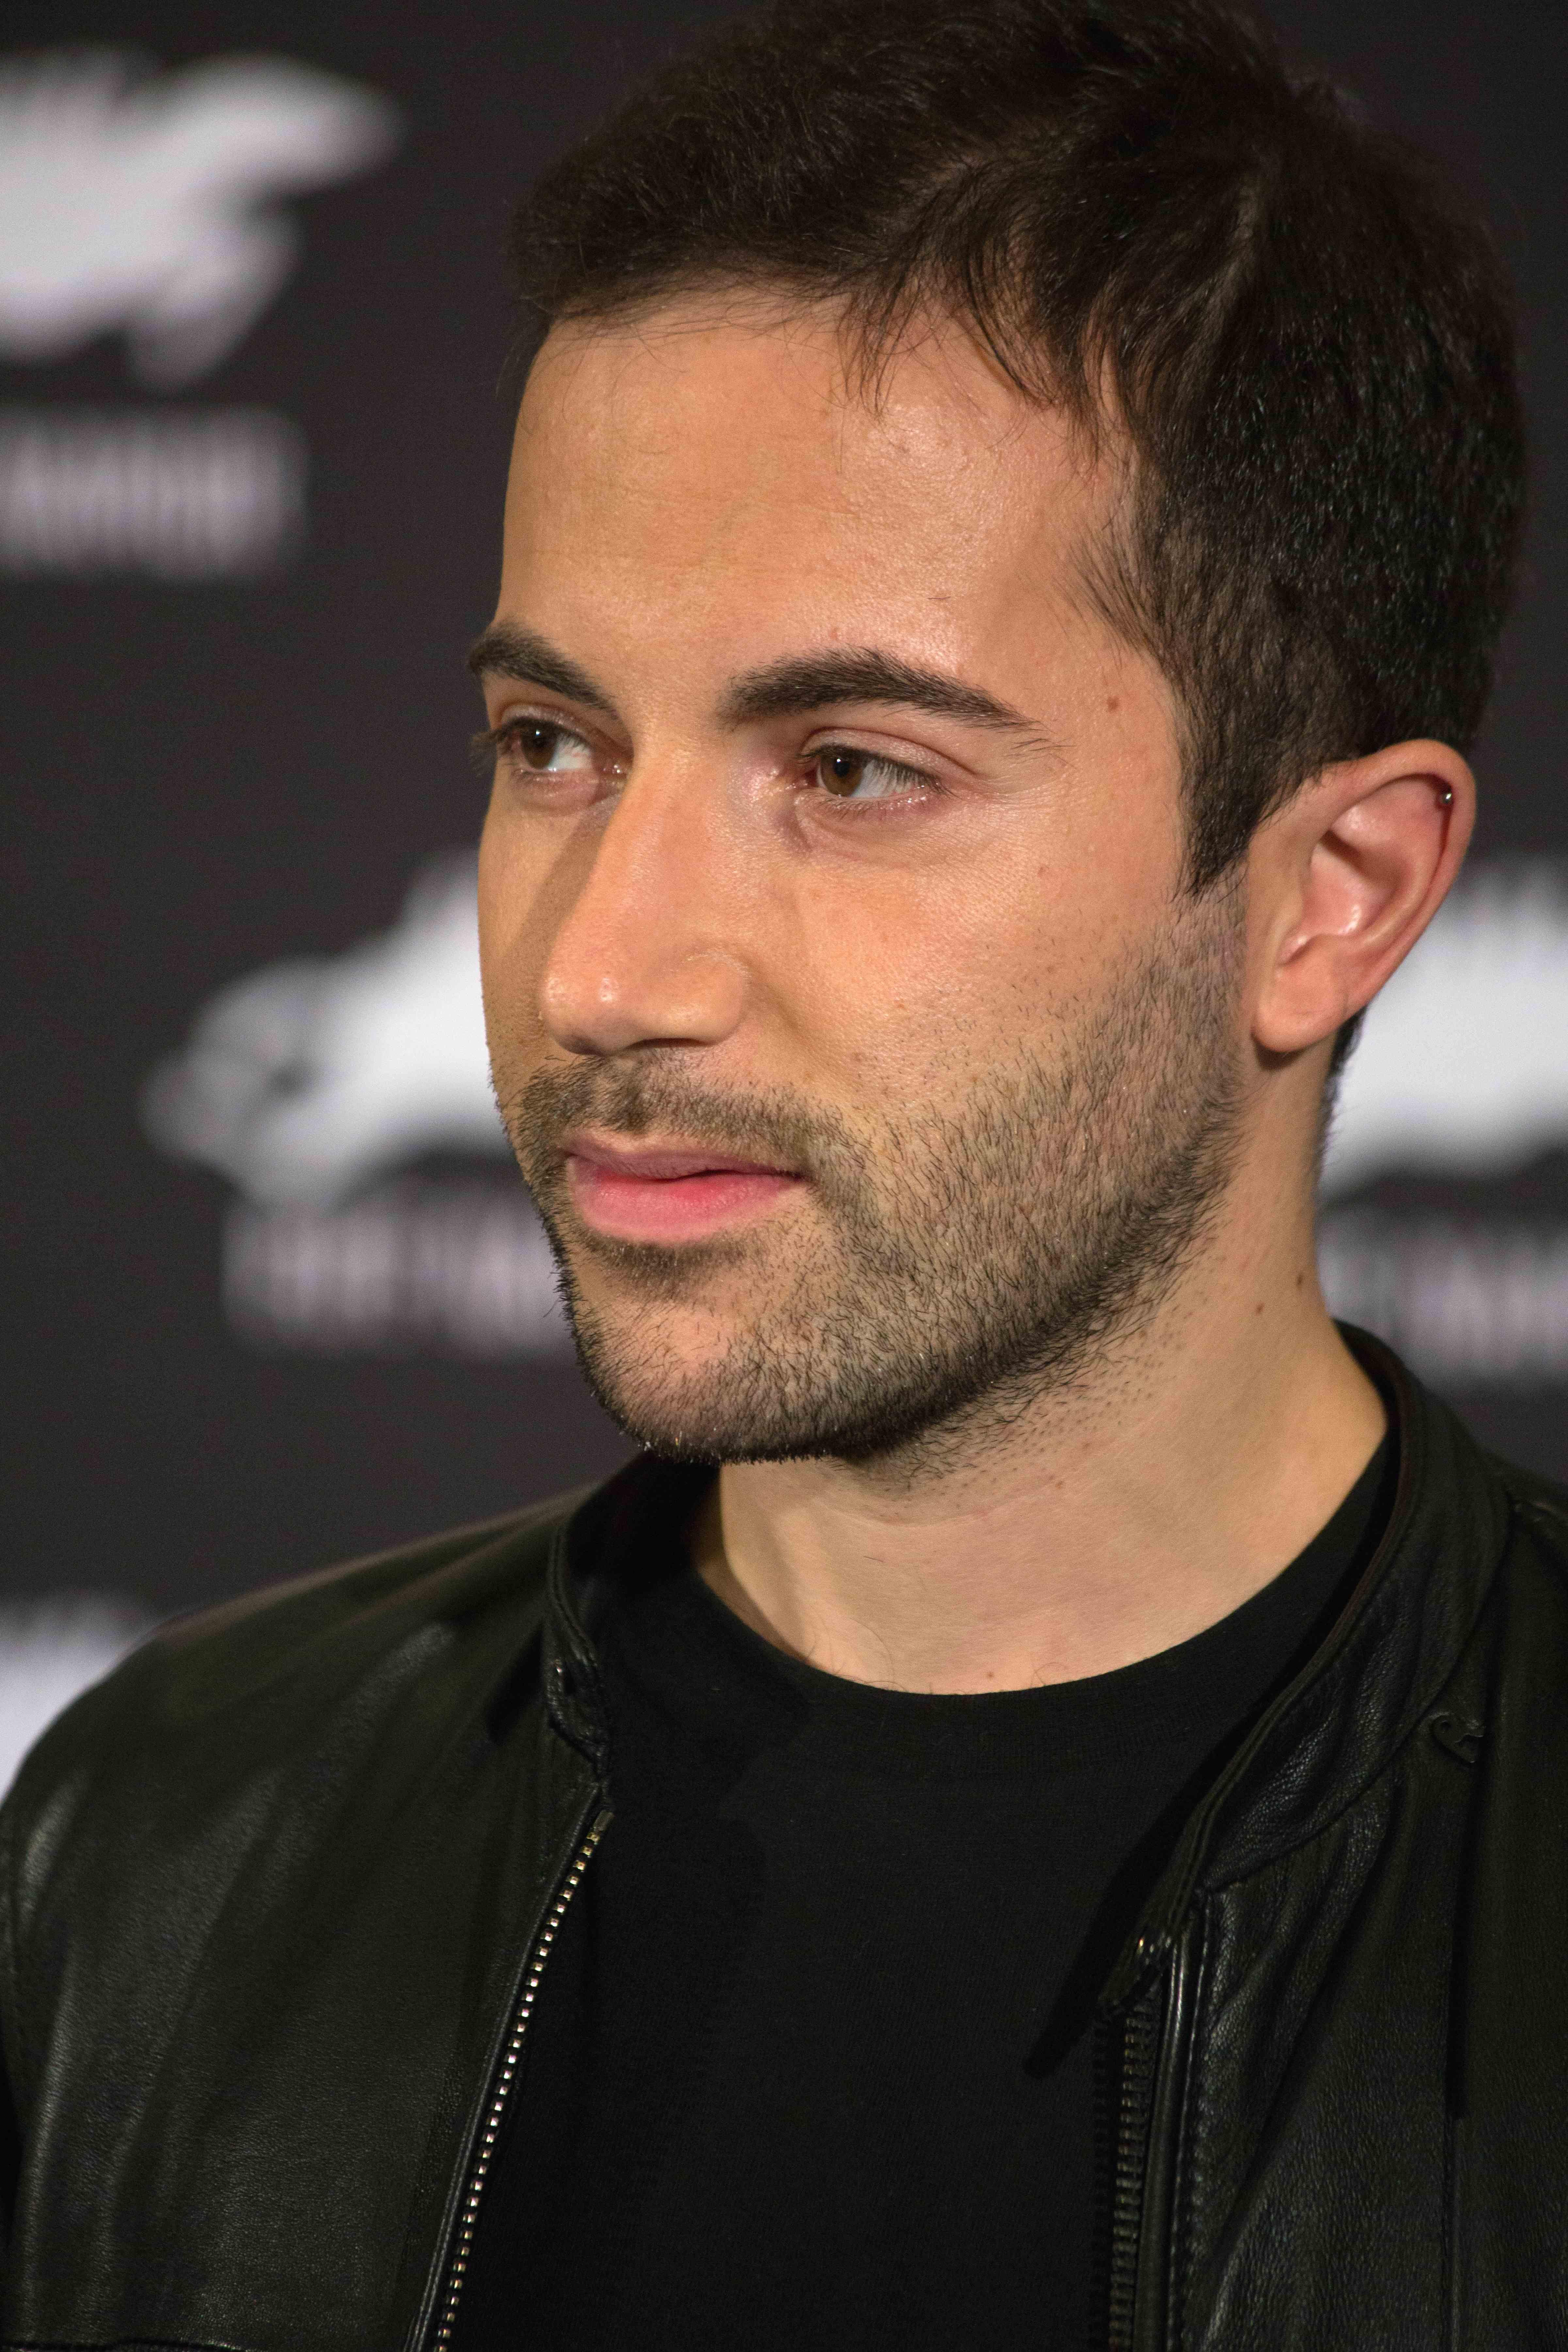 Man with dark hair and dark shirt